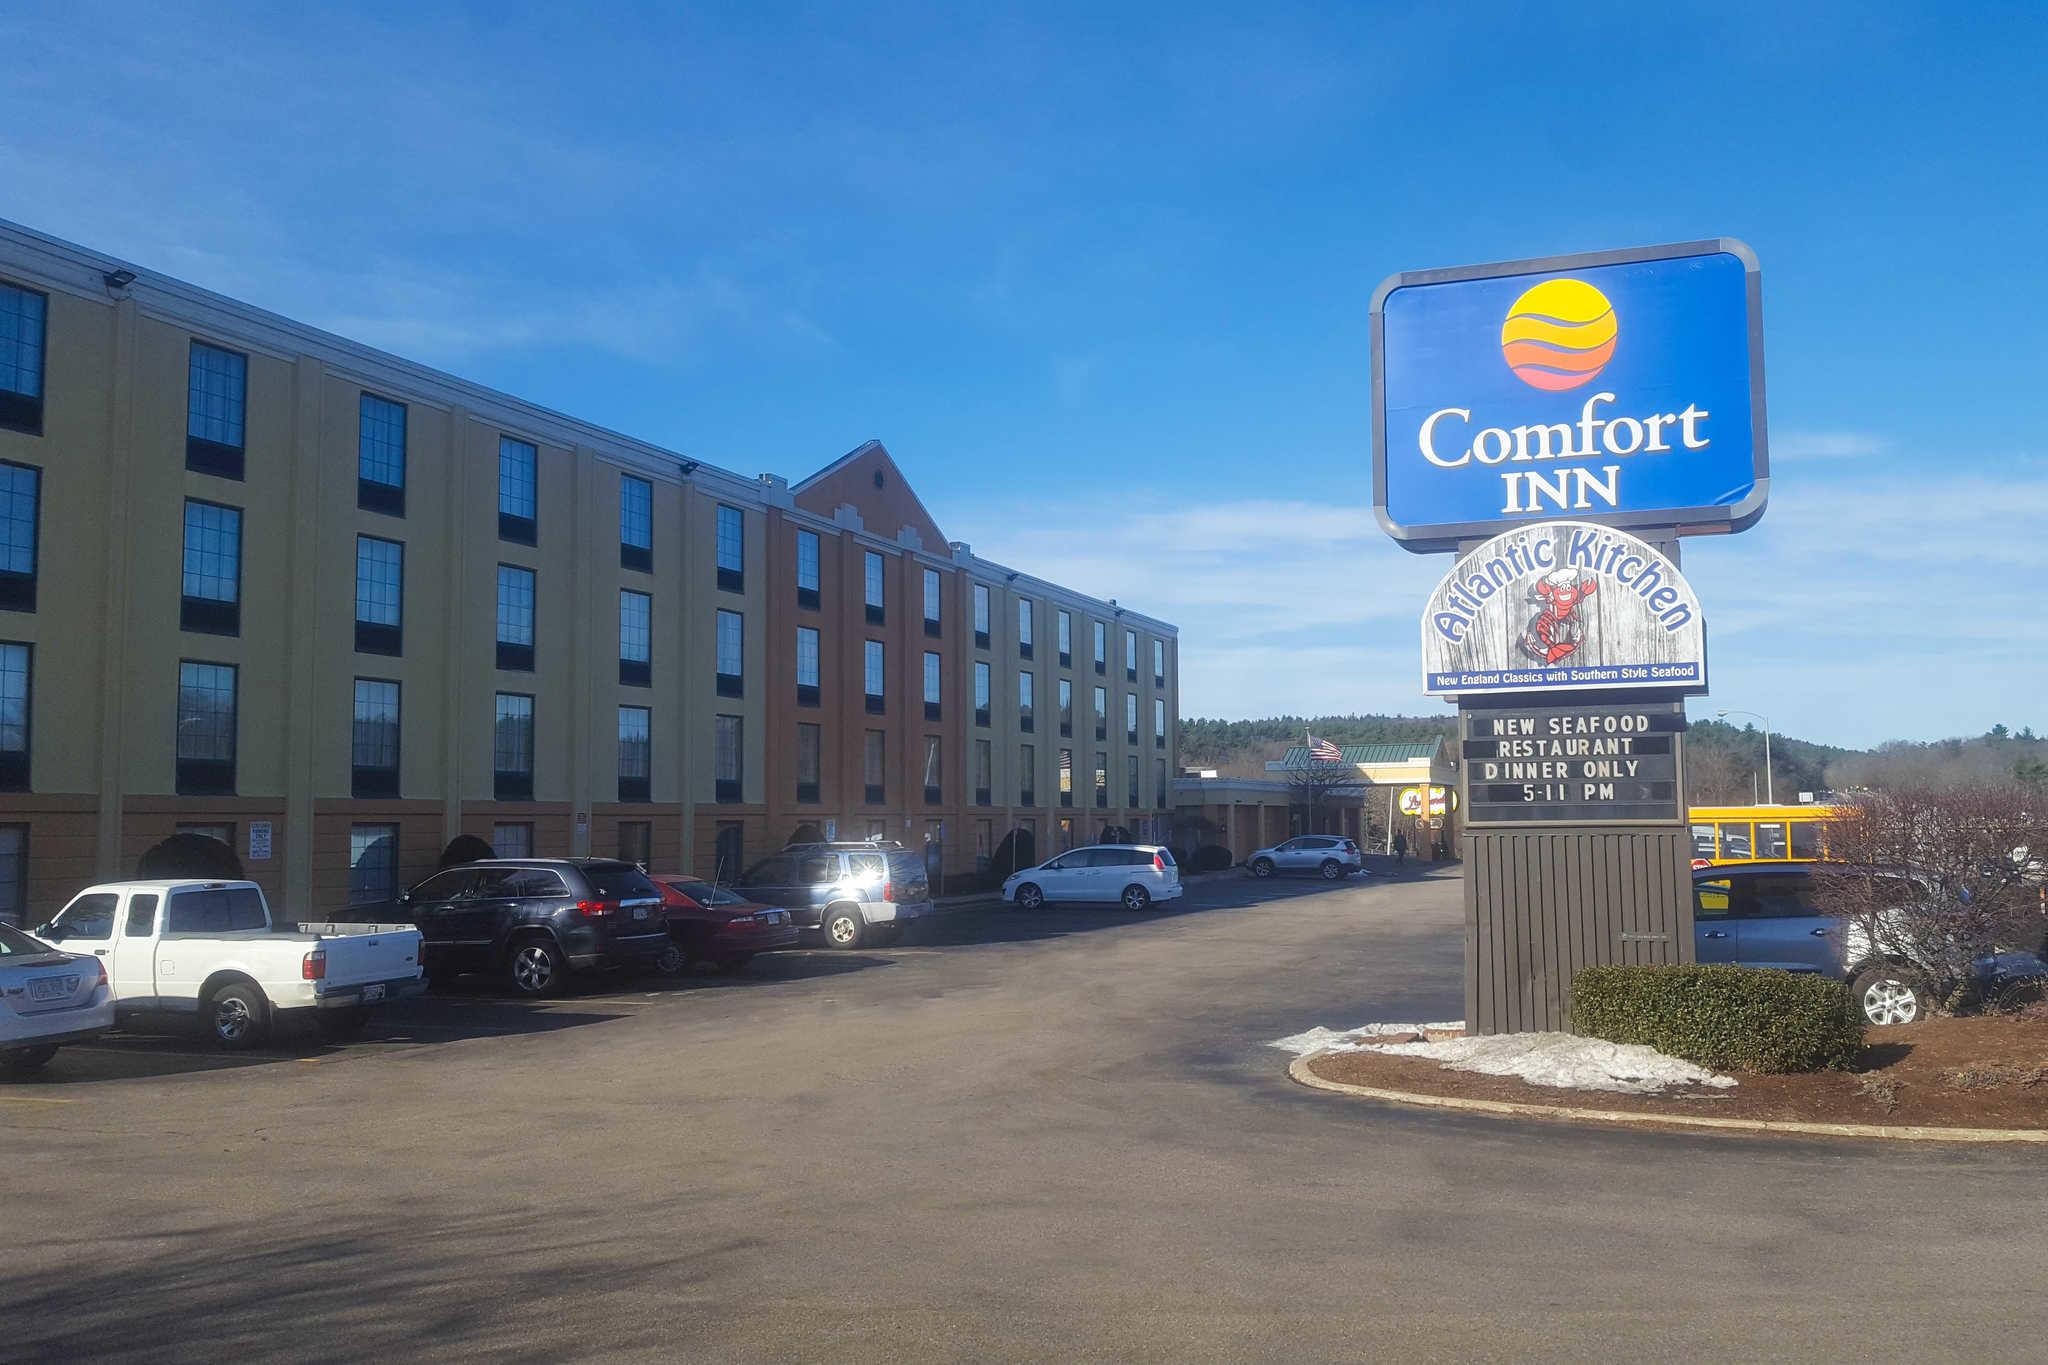 Comfort Inn Randolph - Boston image 0